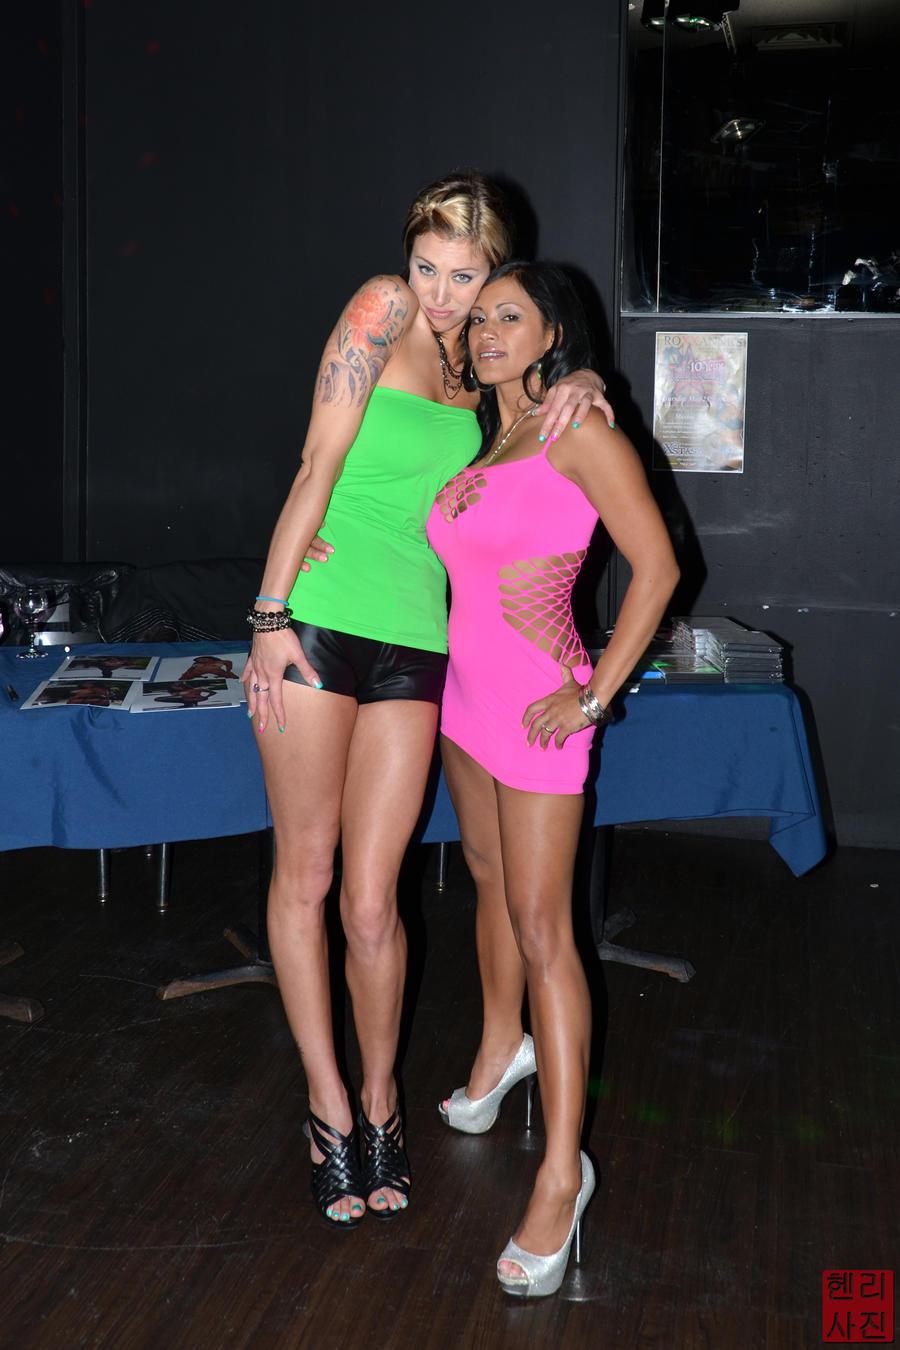 Maxine X naked 526